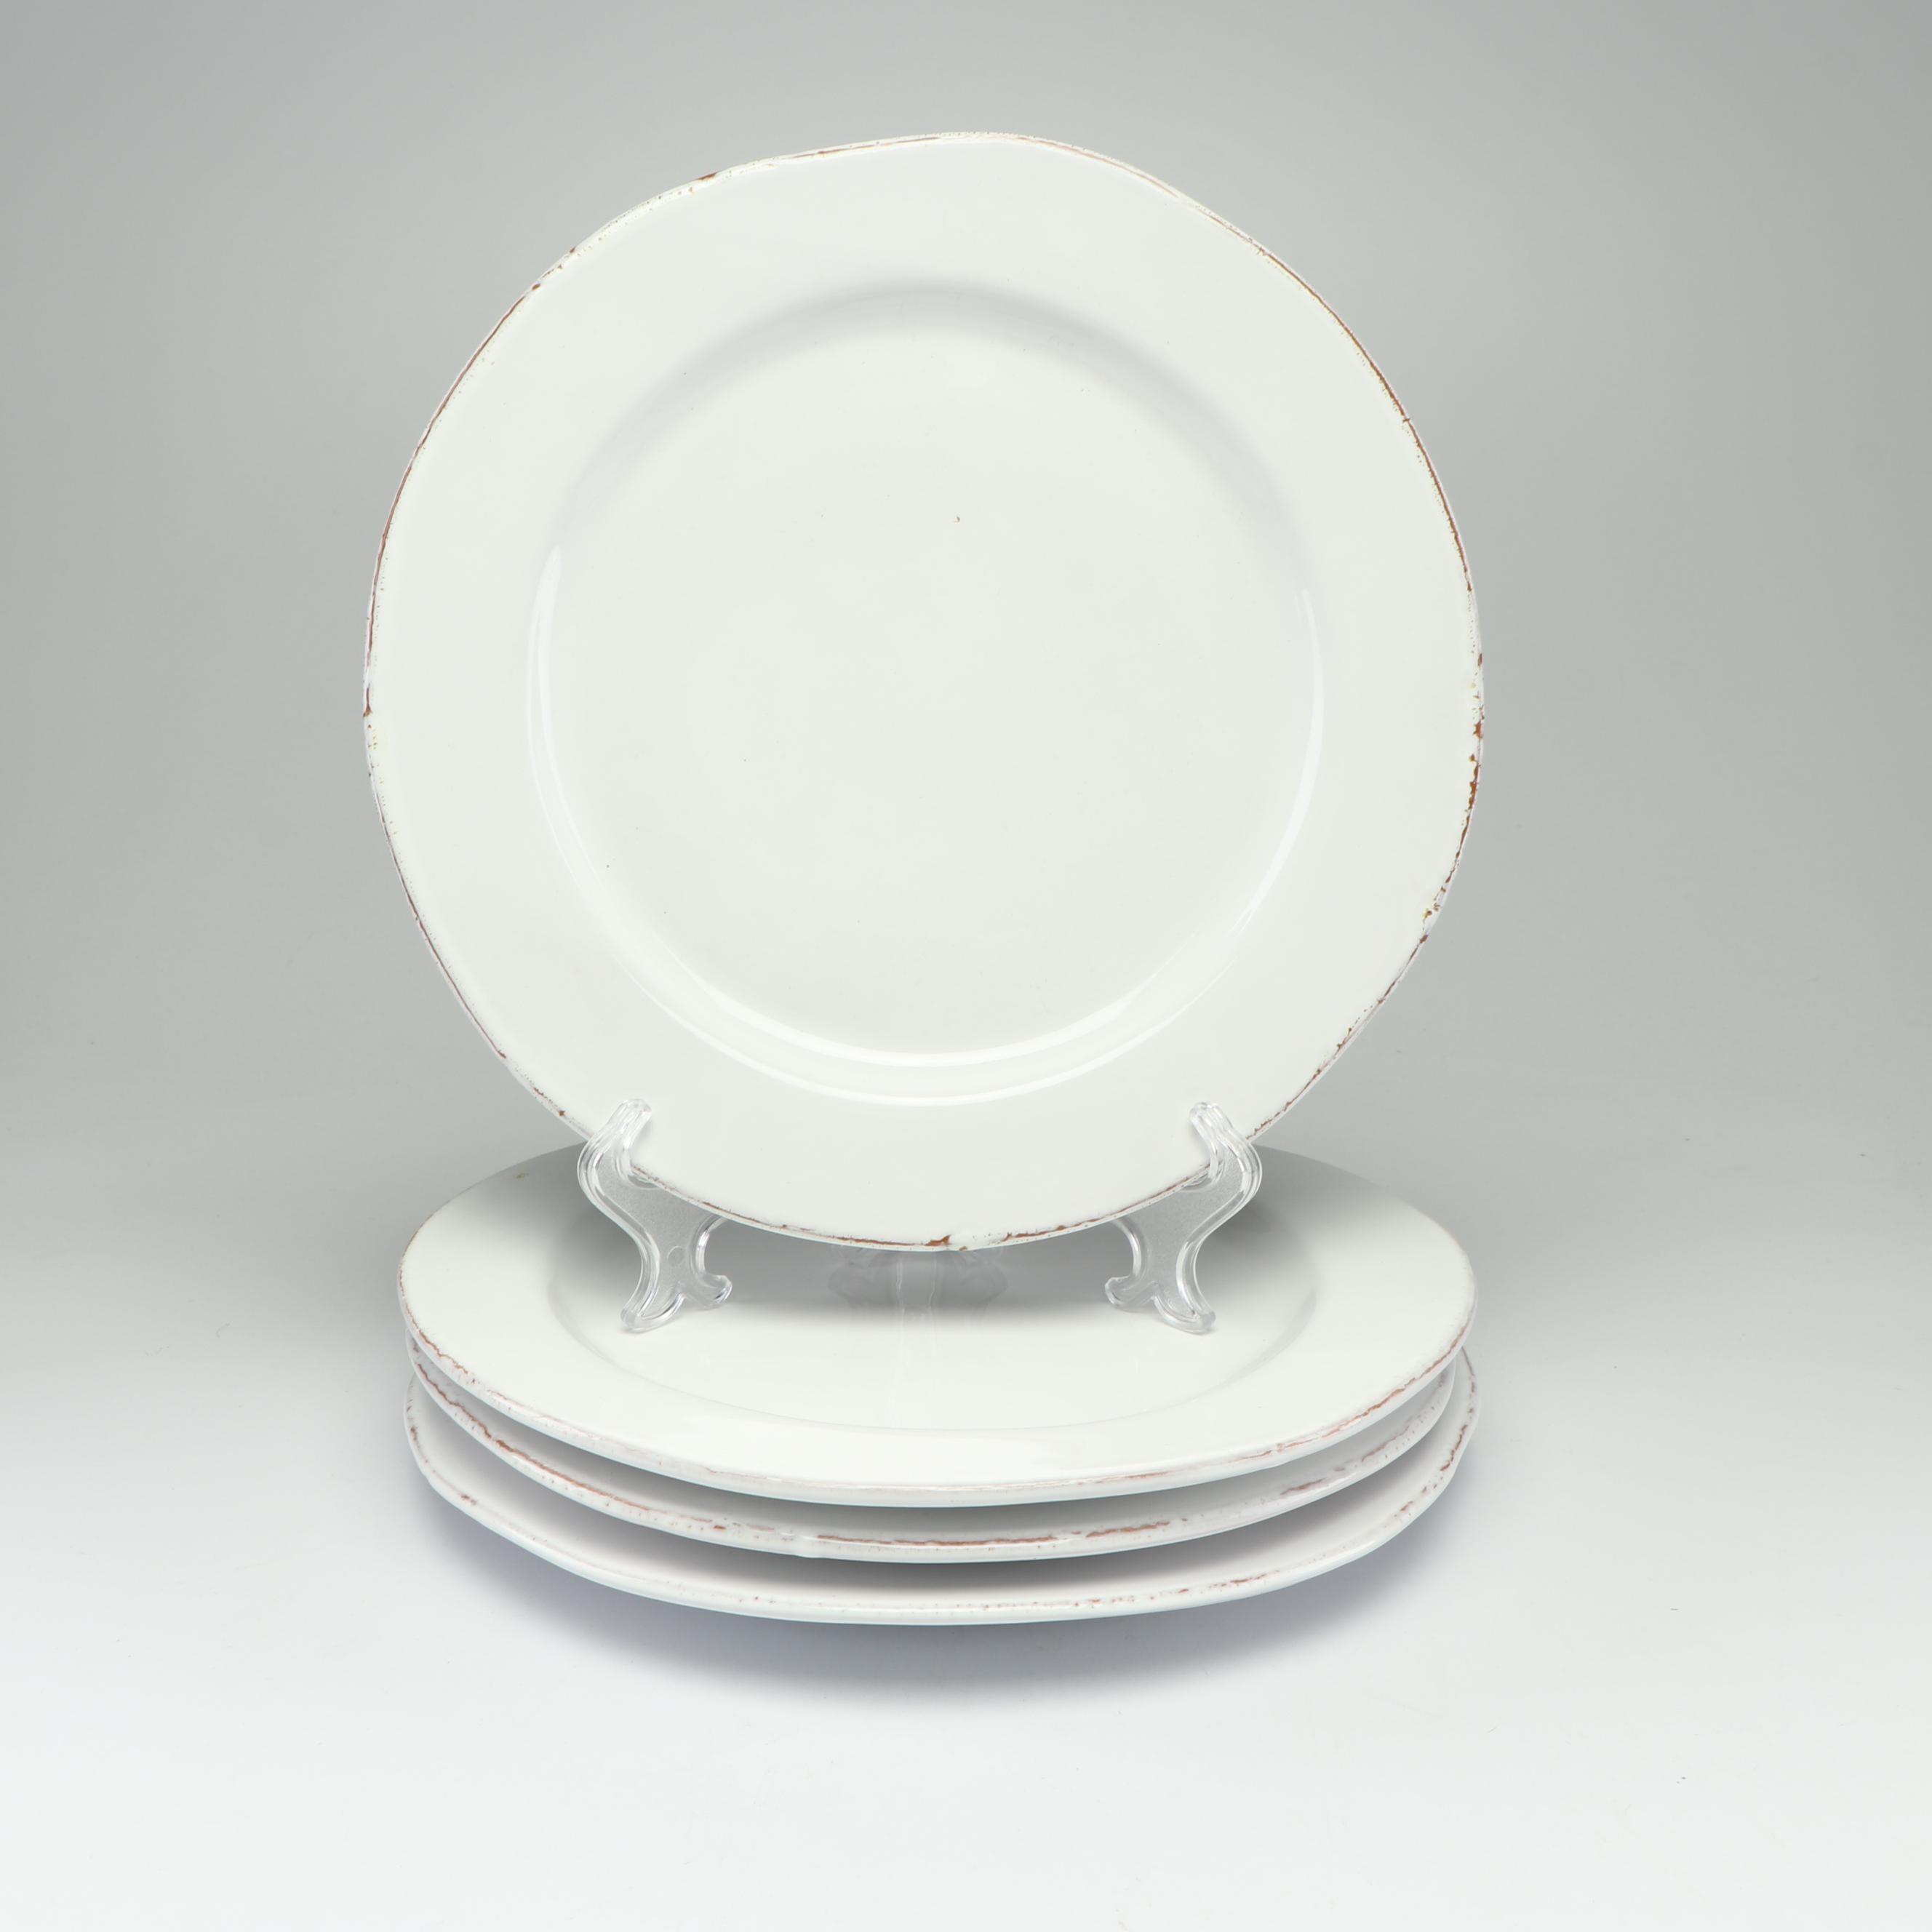 Vietri Italian Ceramic Chargers